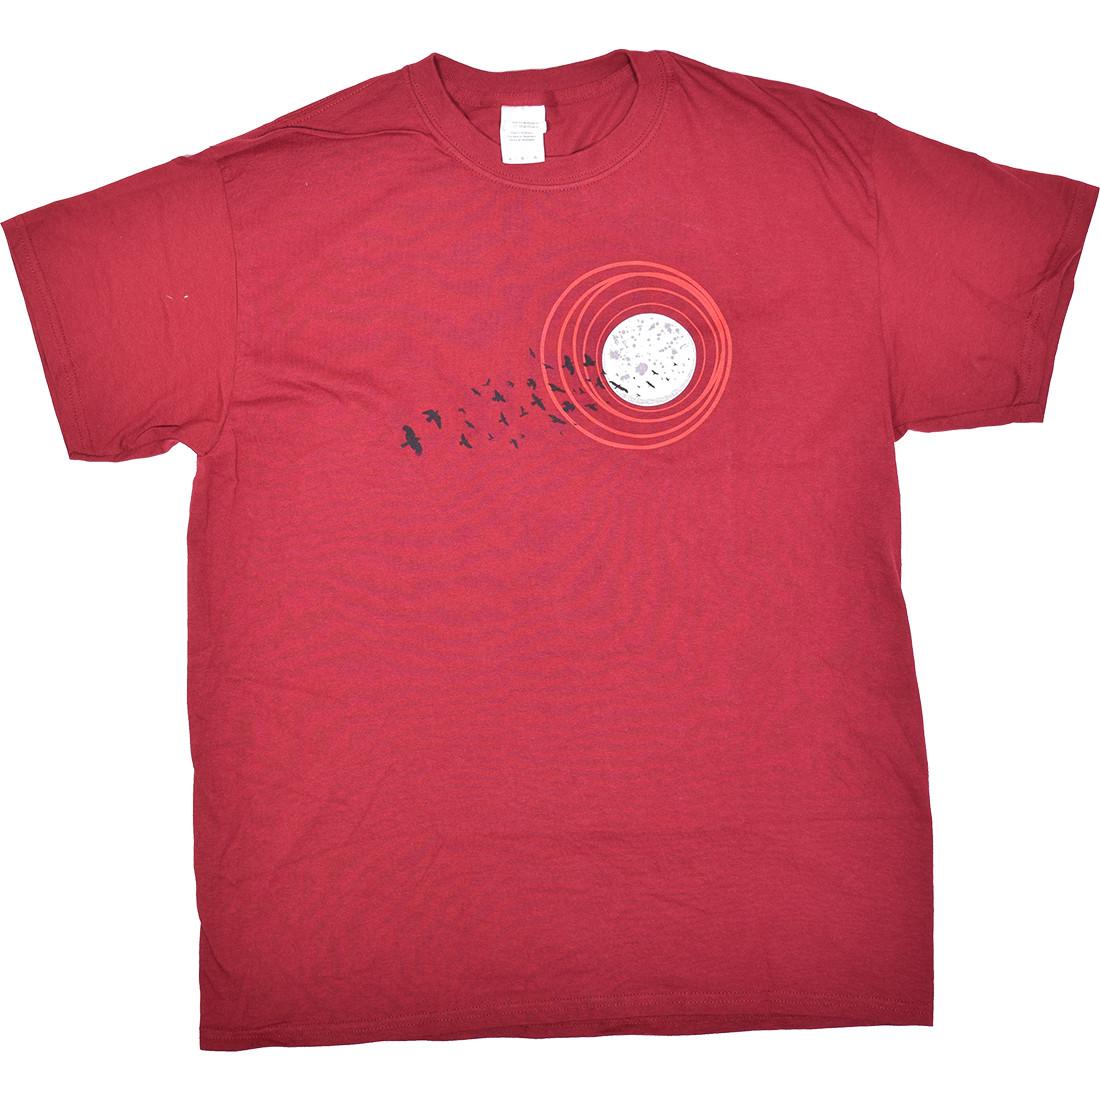 Widespread Panic Broomfield Halloween Red T-Shirt